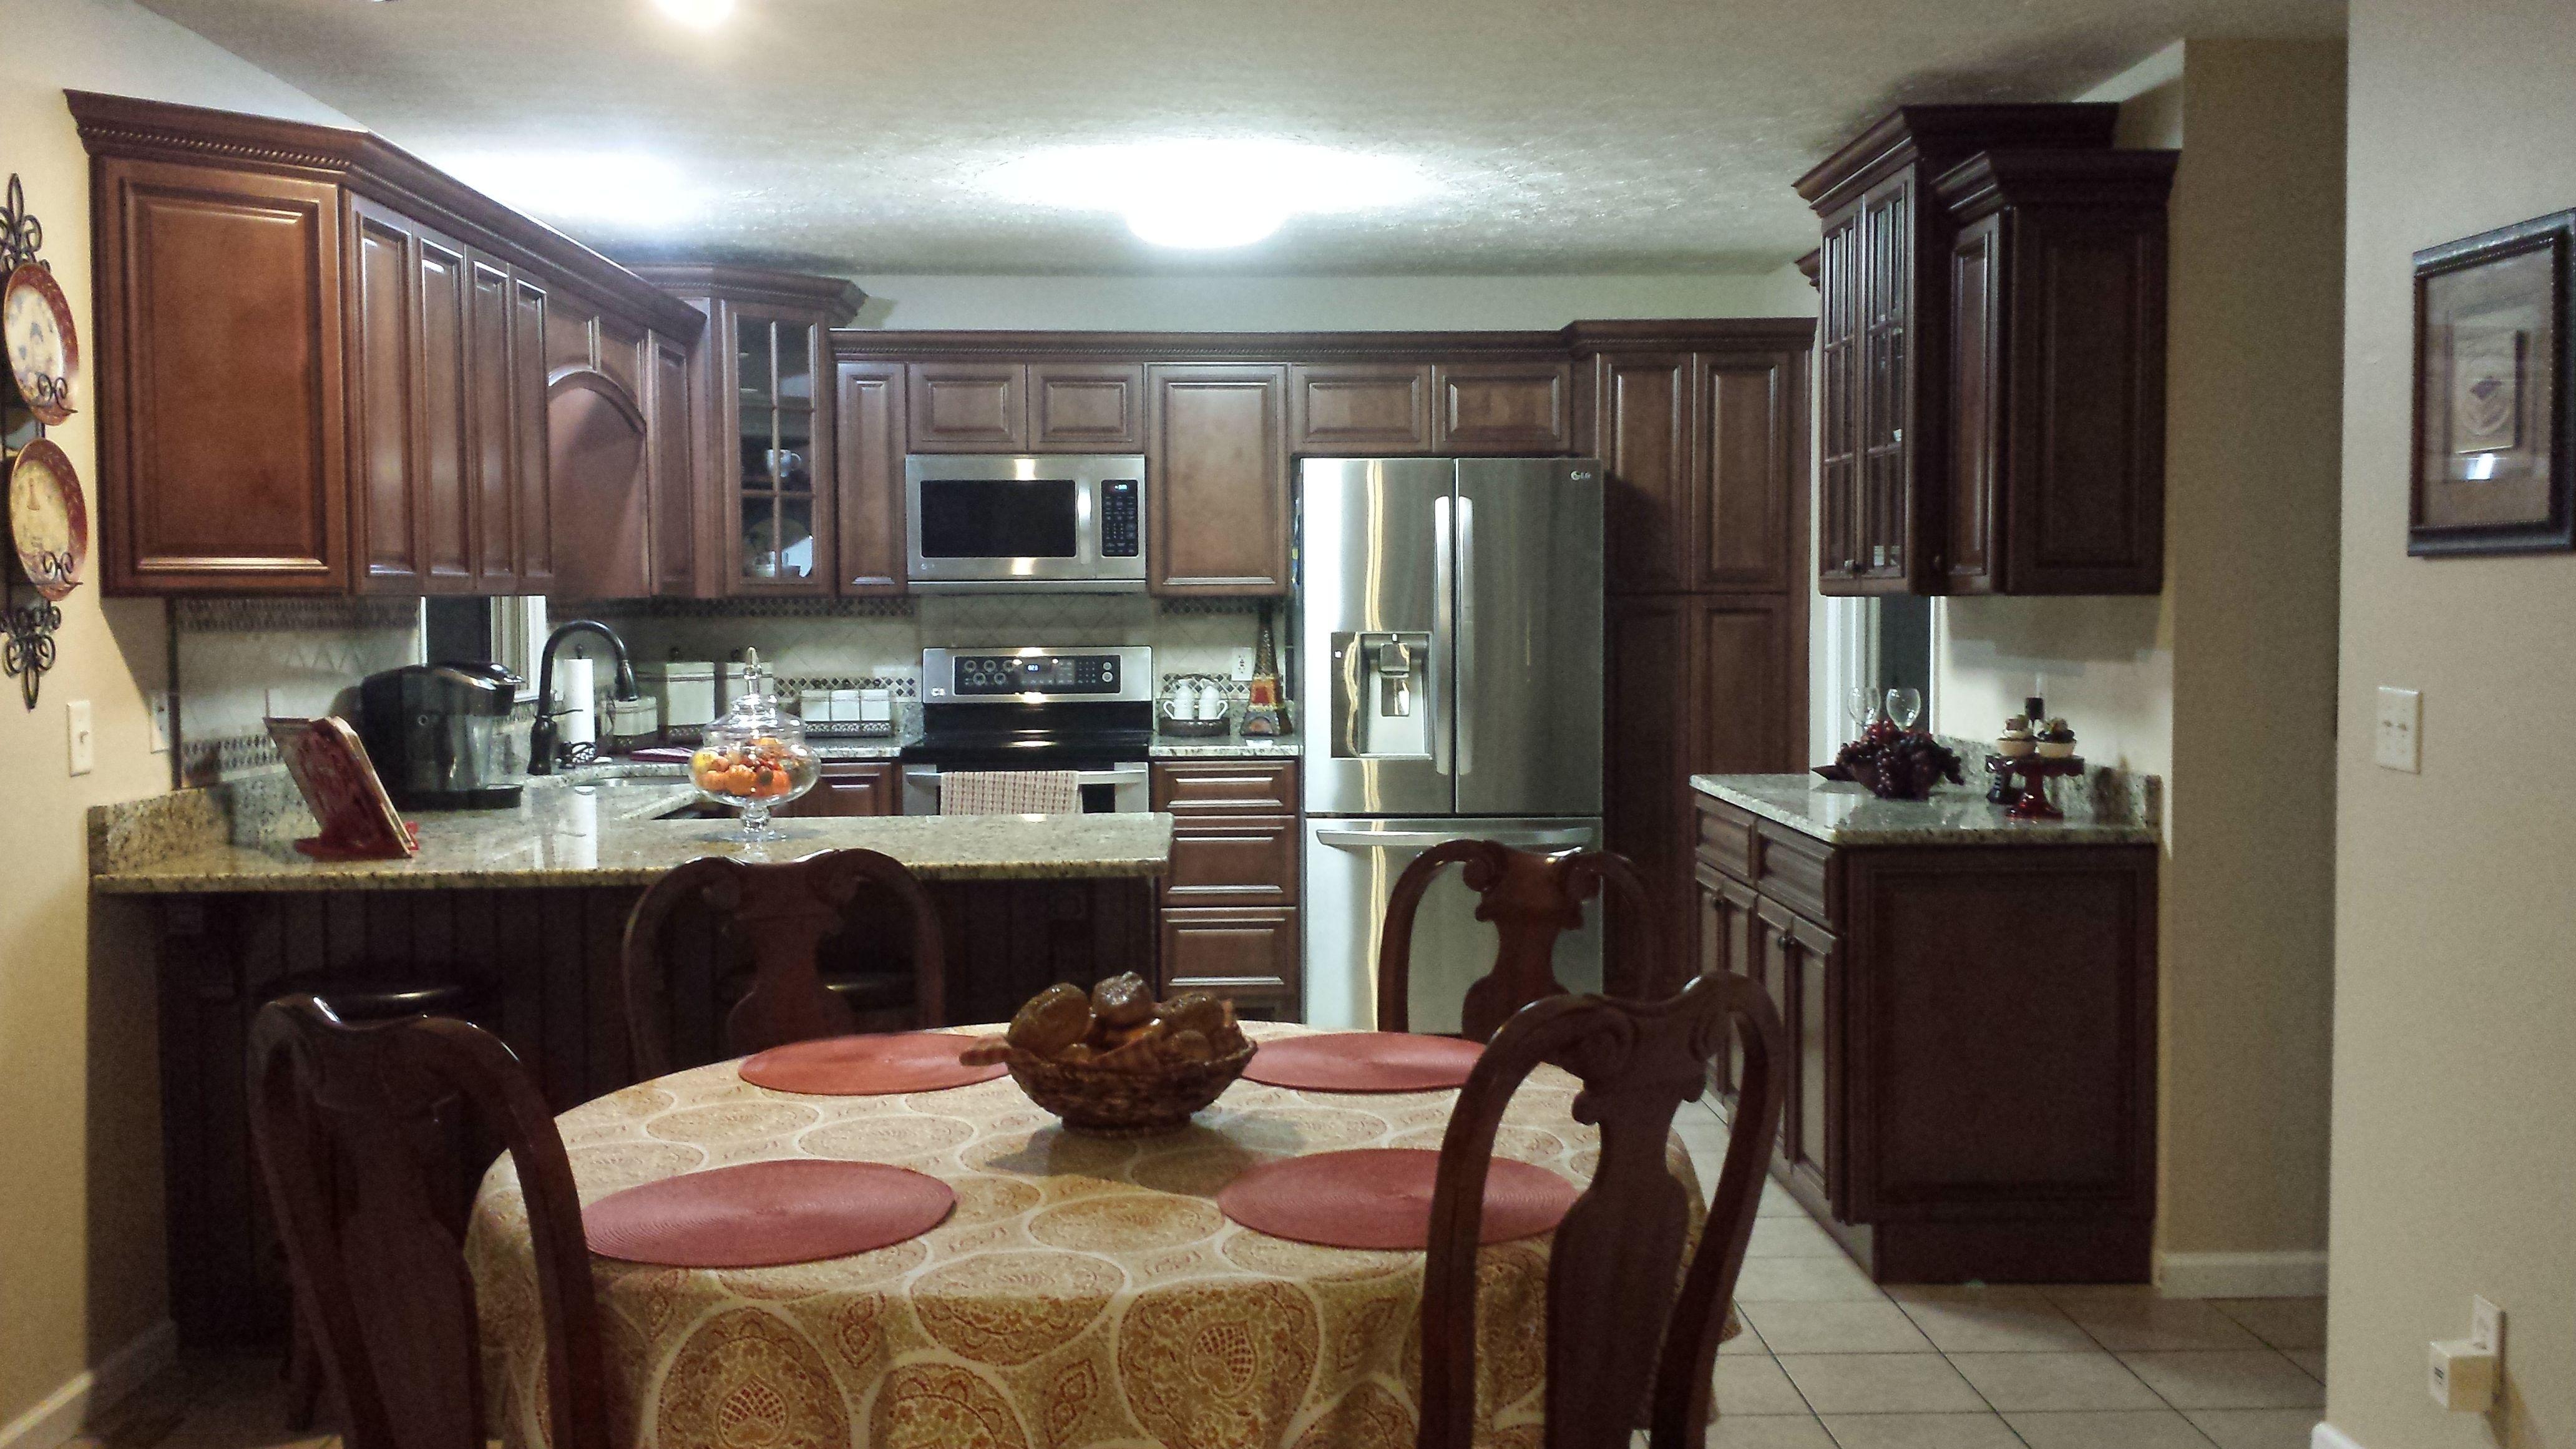 Signature Kitchen Cabinets Signature Brownstone Cabinets With Granite Countertops Berea Ky